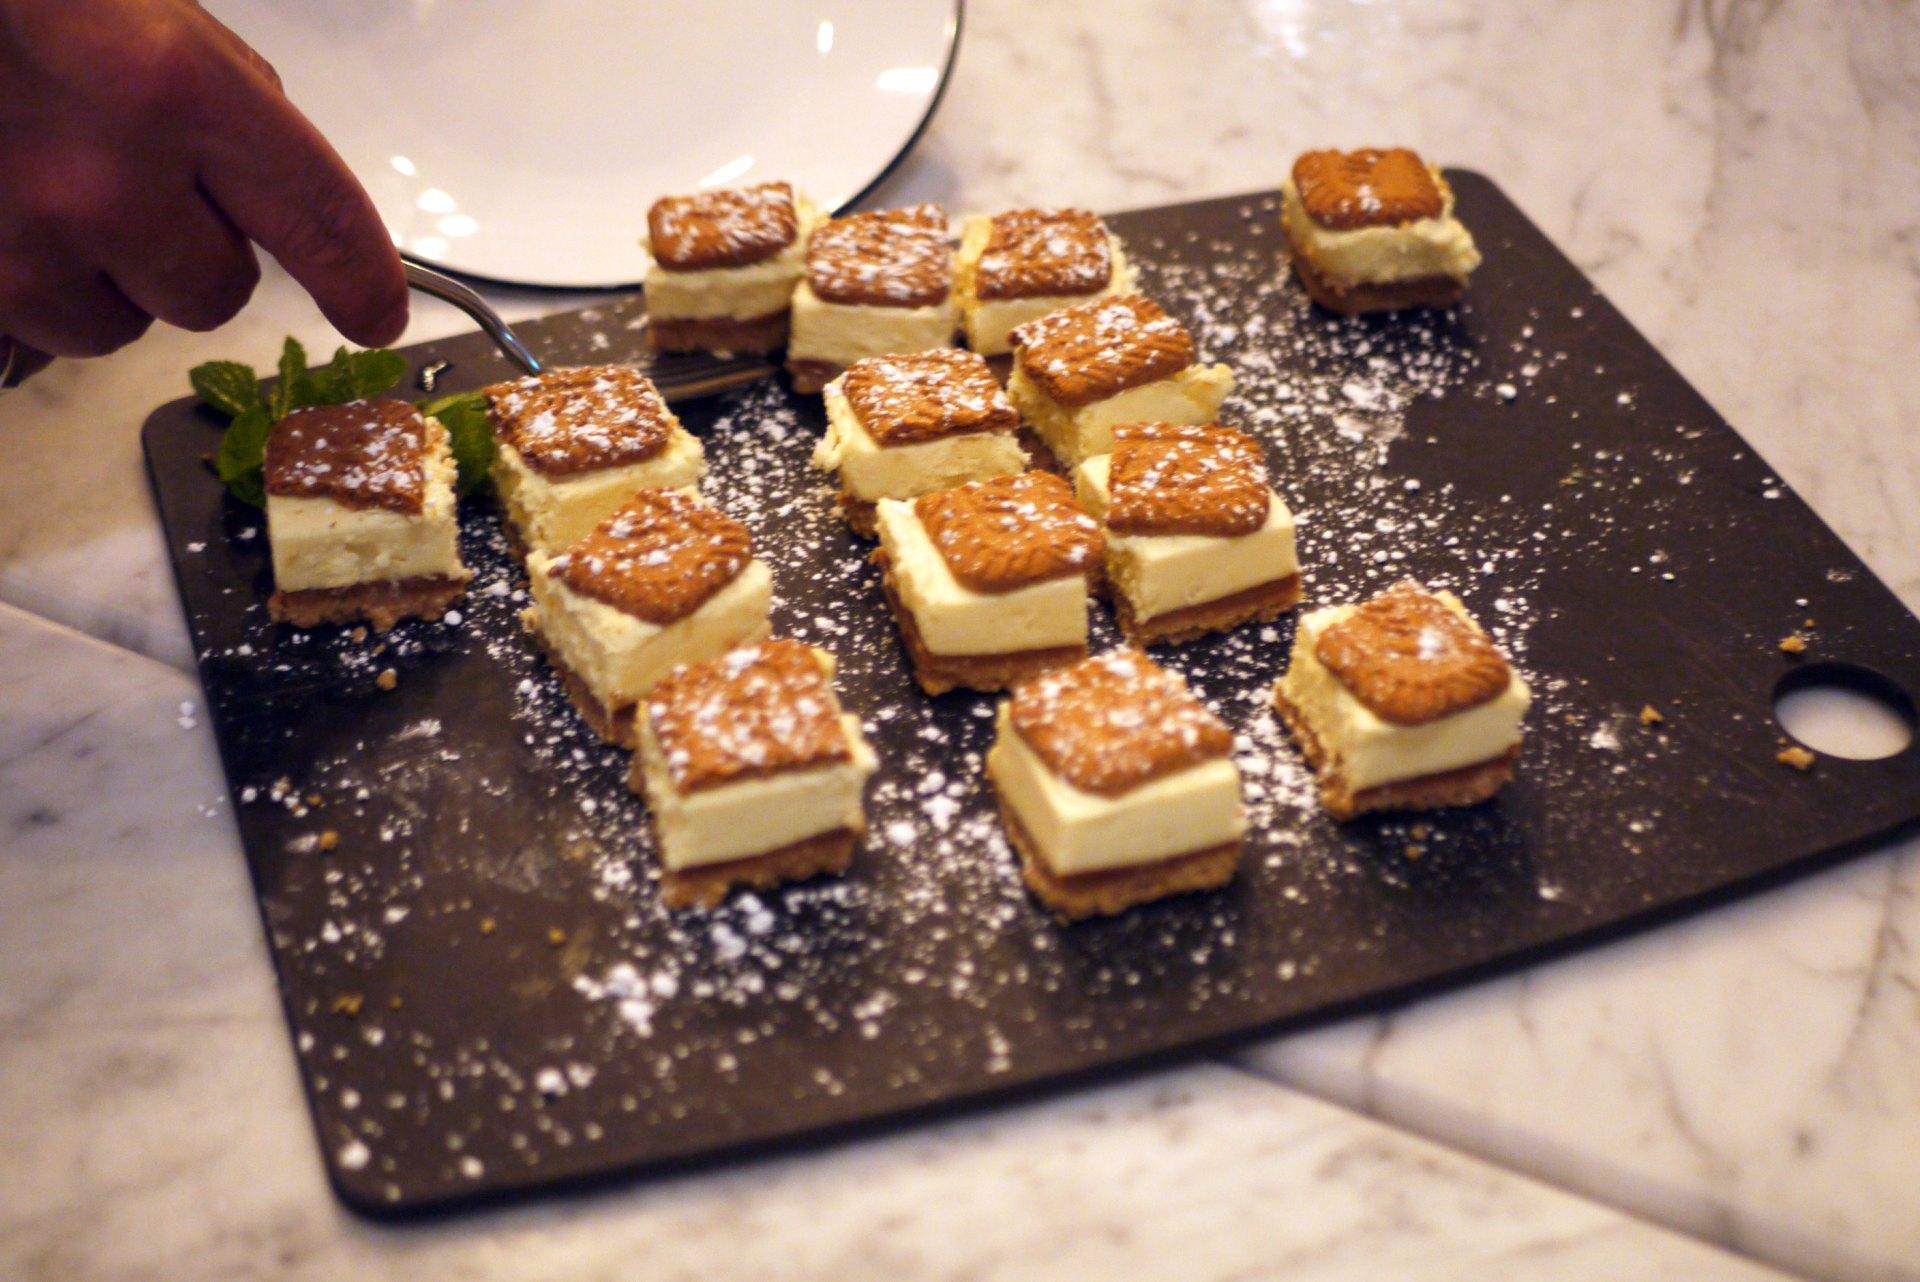 Lotus Biscoff Cheesecake (£5.35) (v)